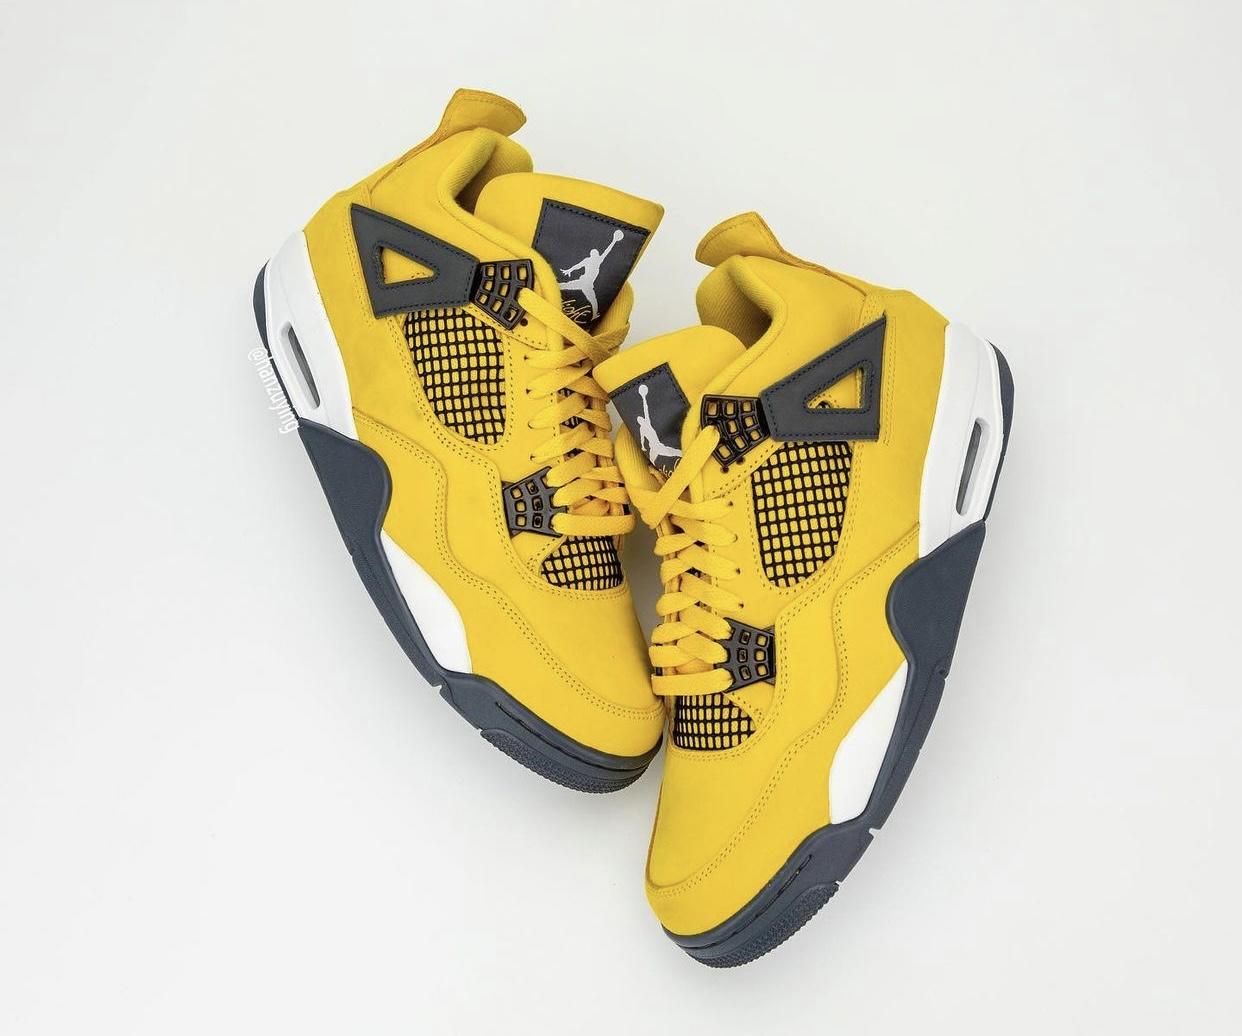 Nike,Air Jordan 4,Jordan Brand   天价鞋今年回归!电母AJ4复刻日期曝光